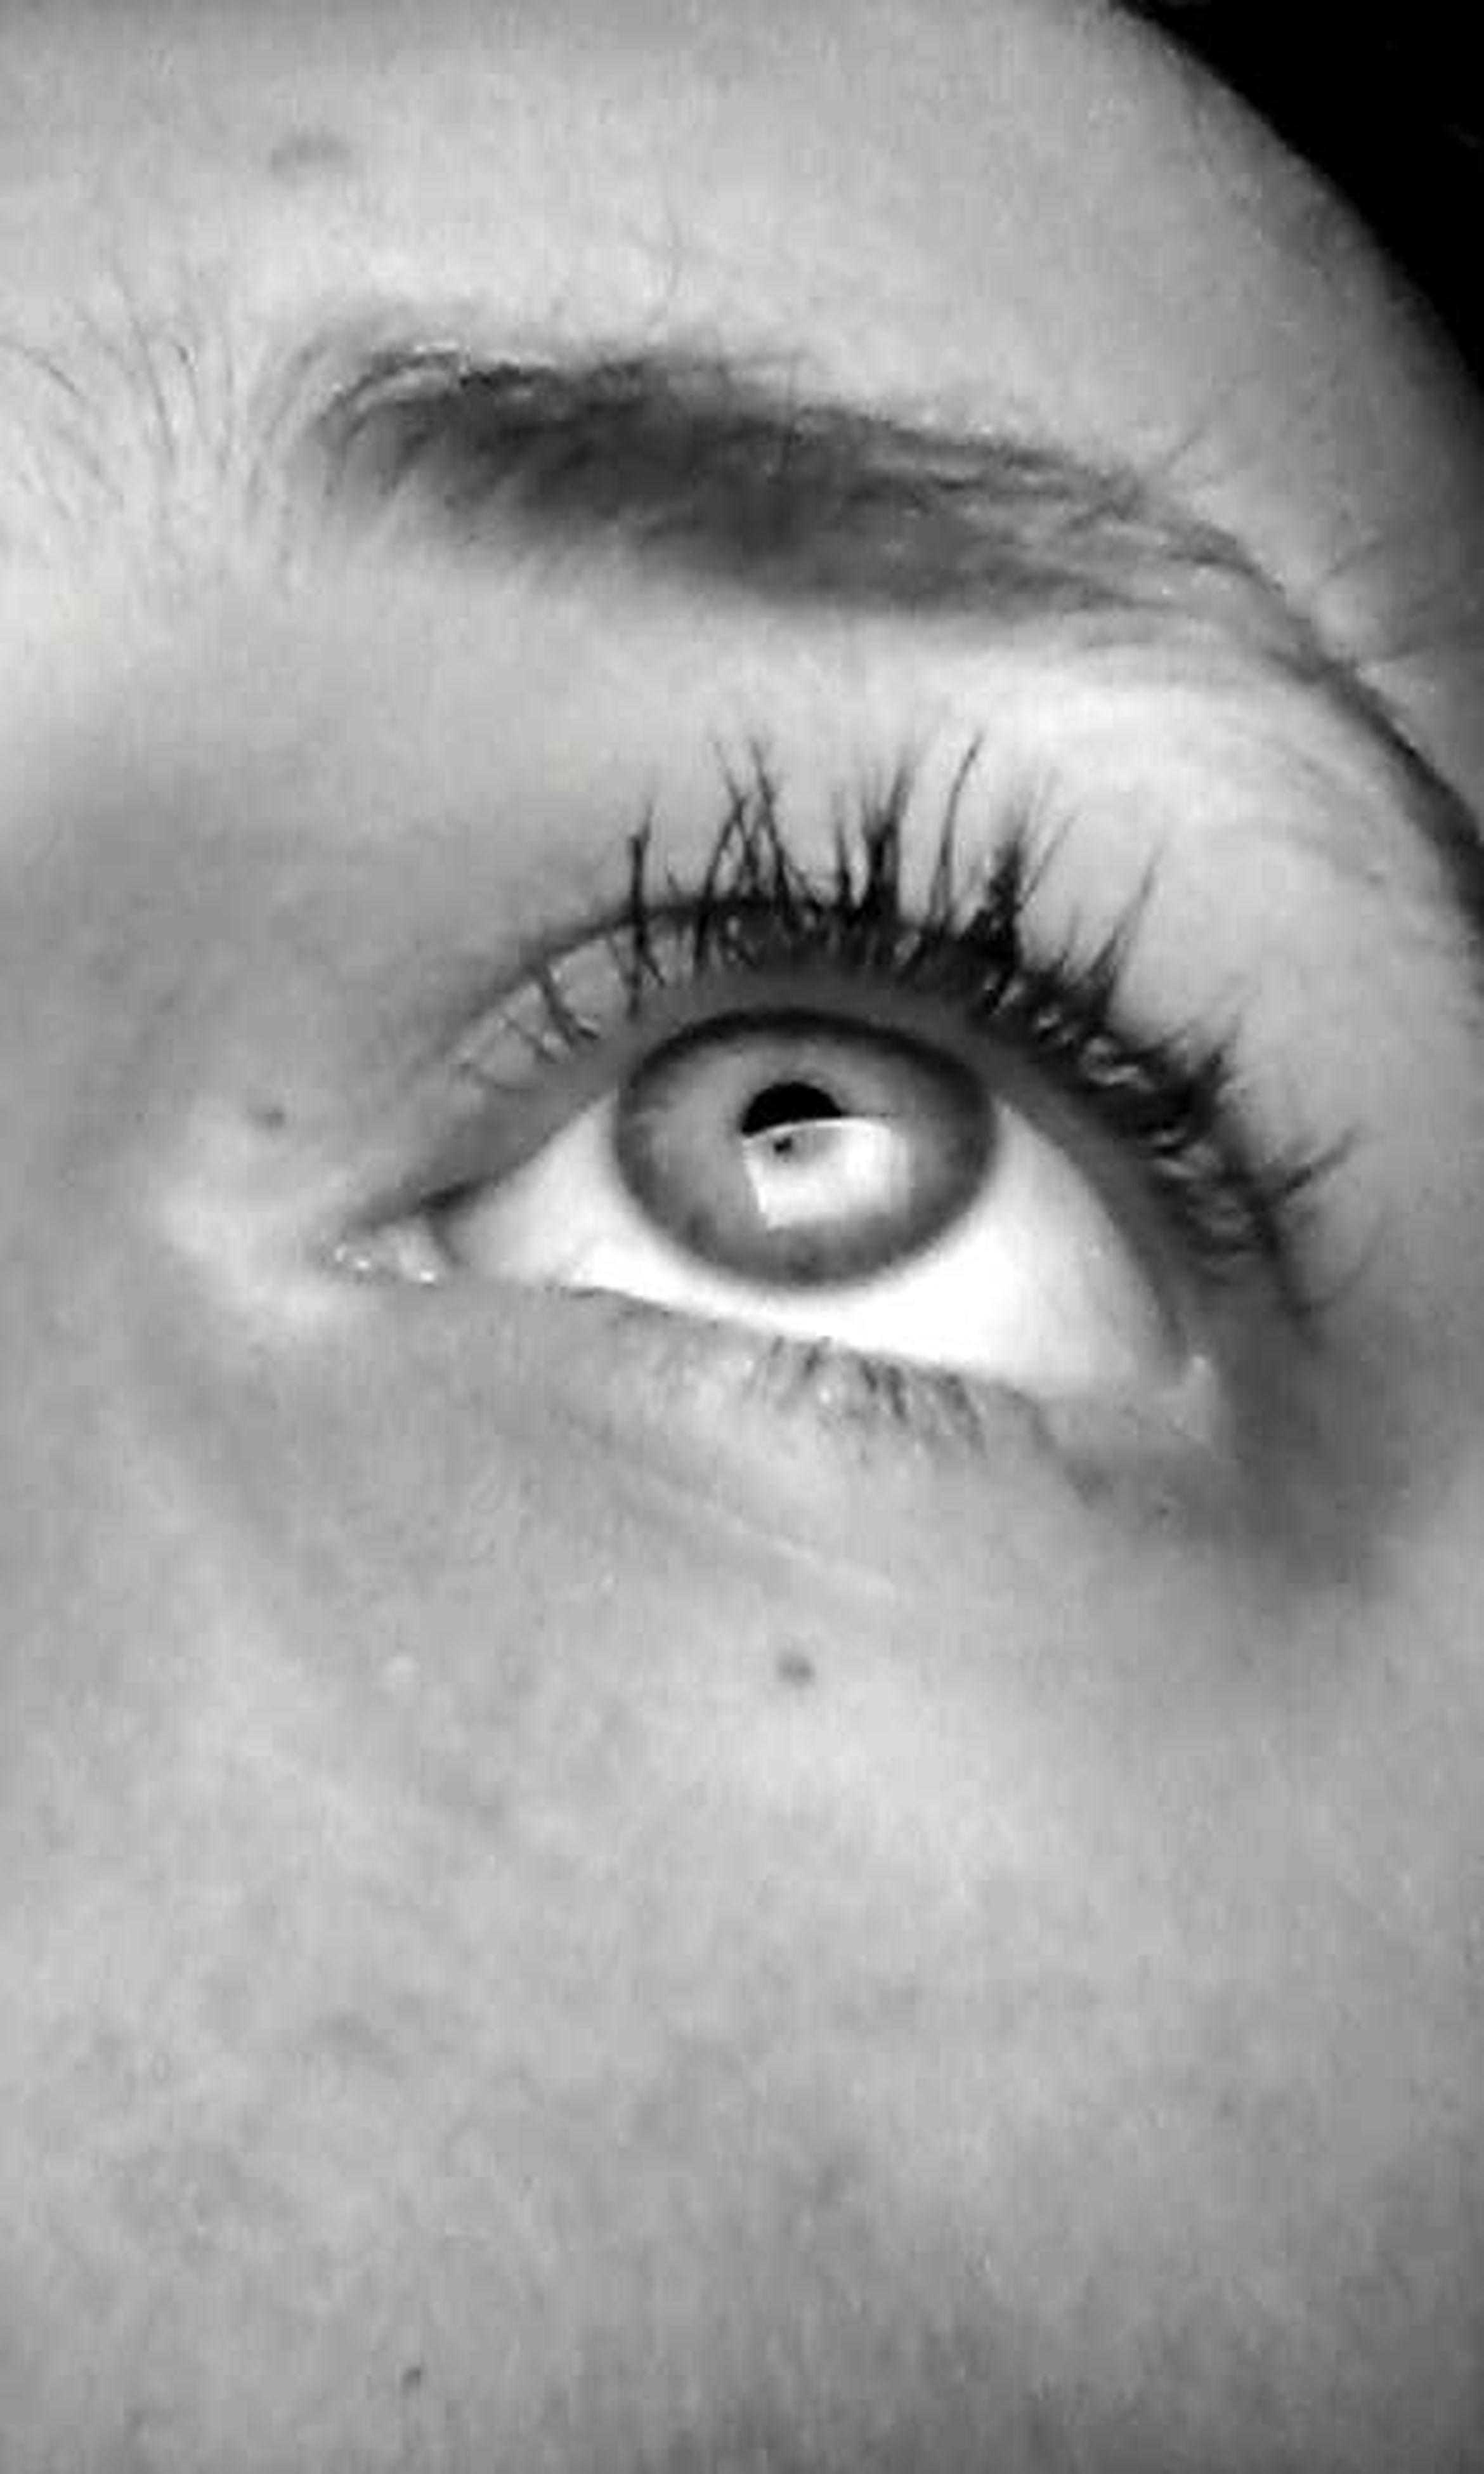 human eye, eyelash, close-up, eyesight, human skin, human face, part of, sensory perception, looking at camera, indoors, lifestyles, portrait, iris - eye, person, studio shot, eyebrow, extreme close-up